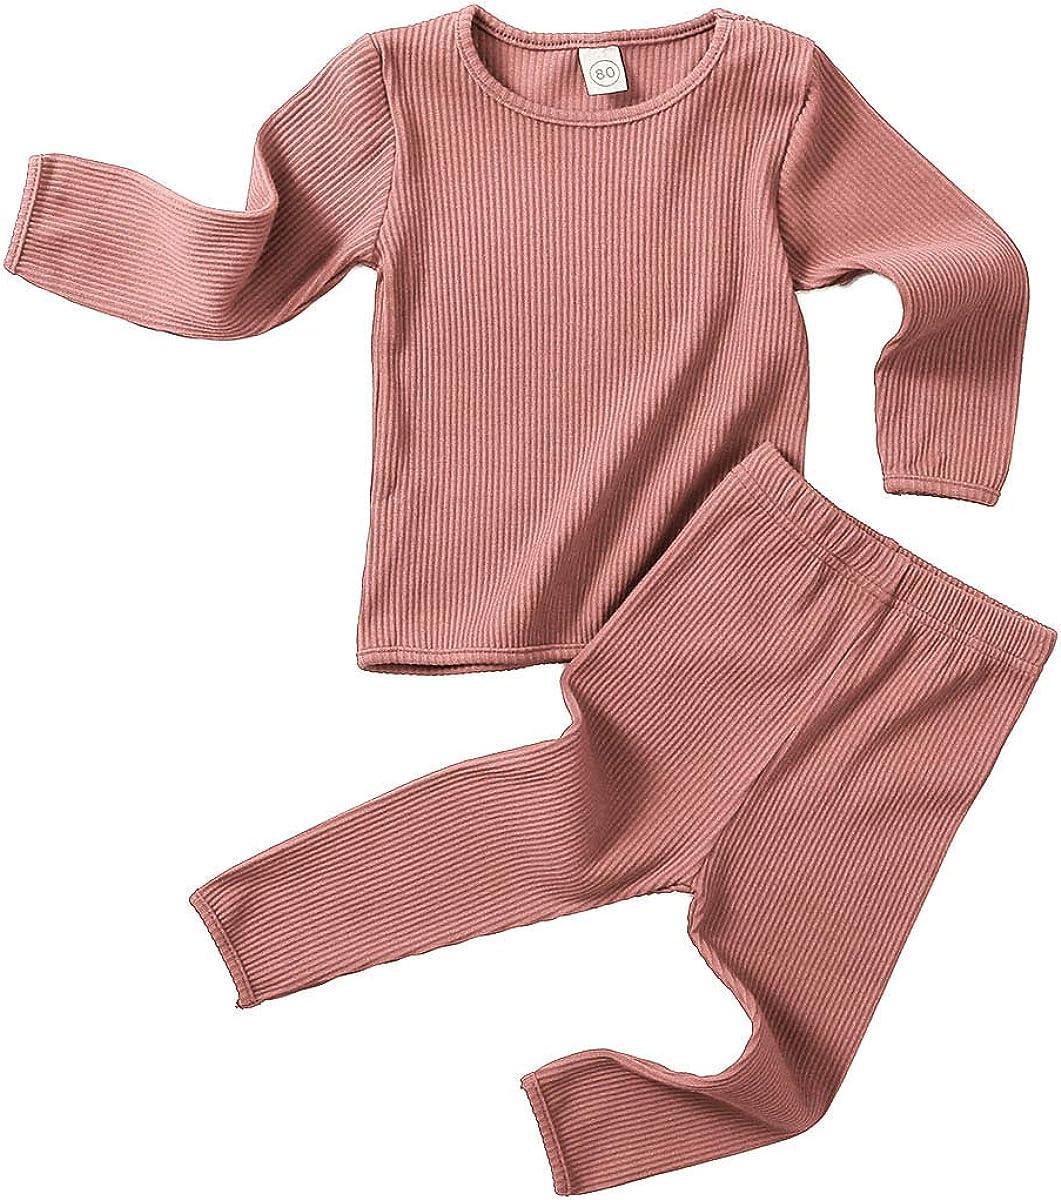 Baby Kids Boy Girl Clothes Pajamas Long Sleeve Spring Sweatsuit Sleepwear Tops + Pants Set Coffee